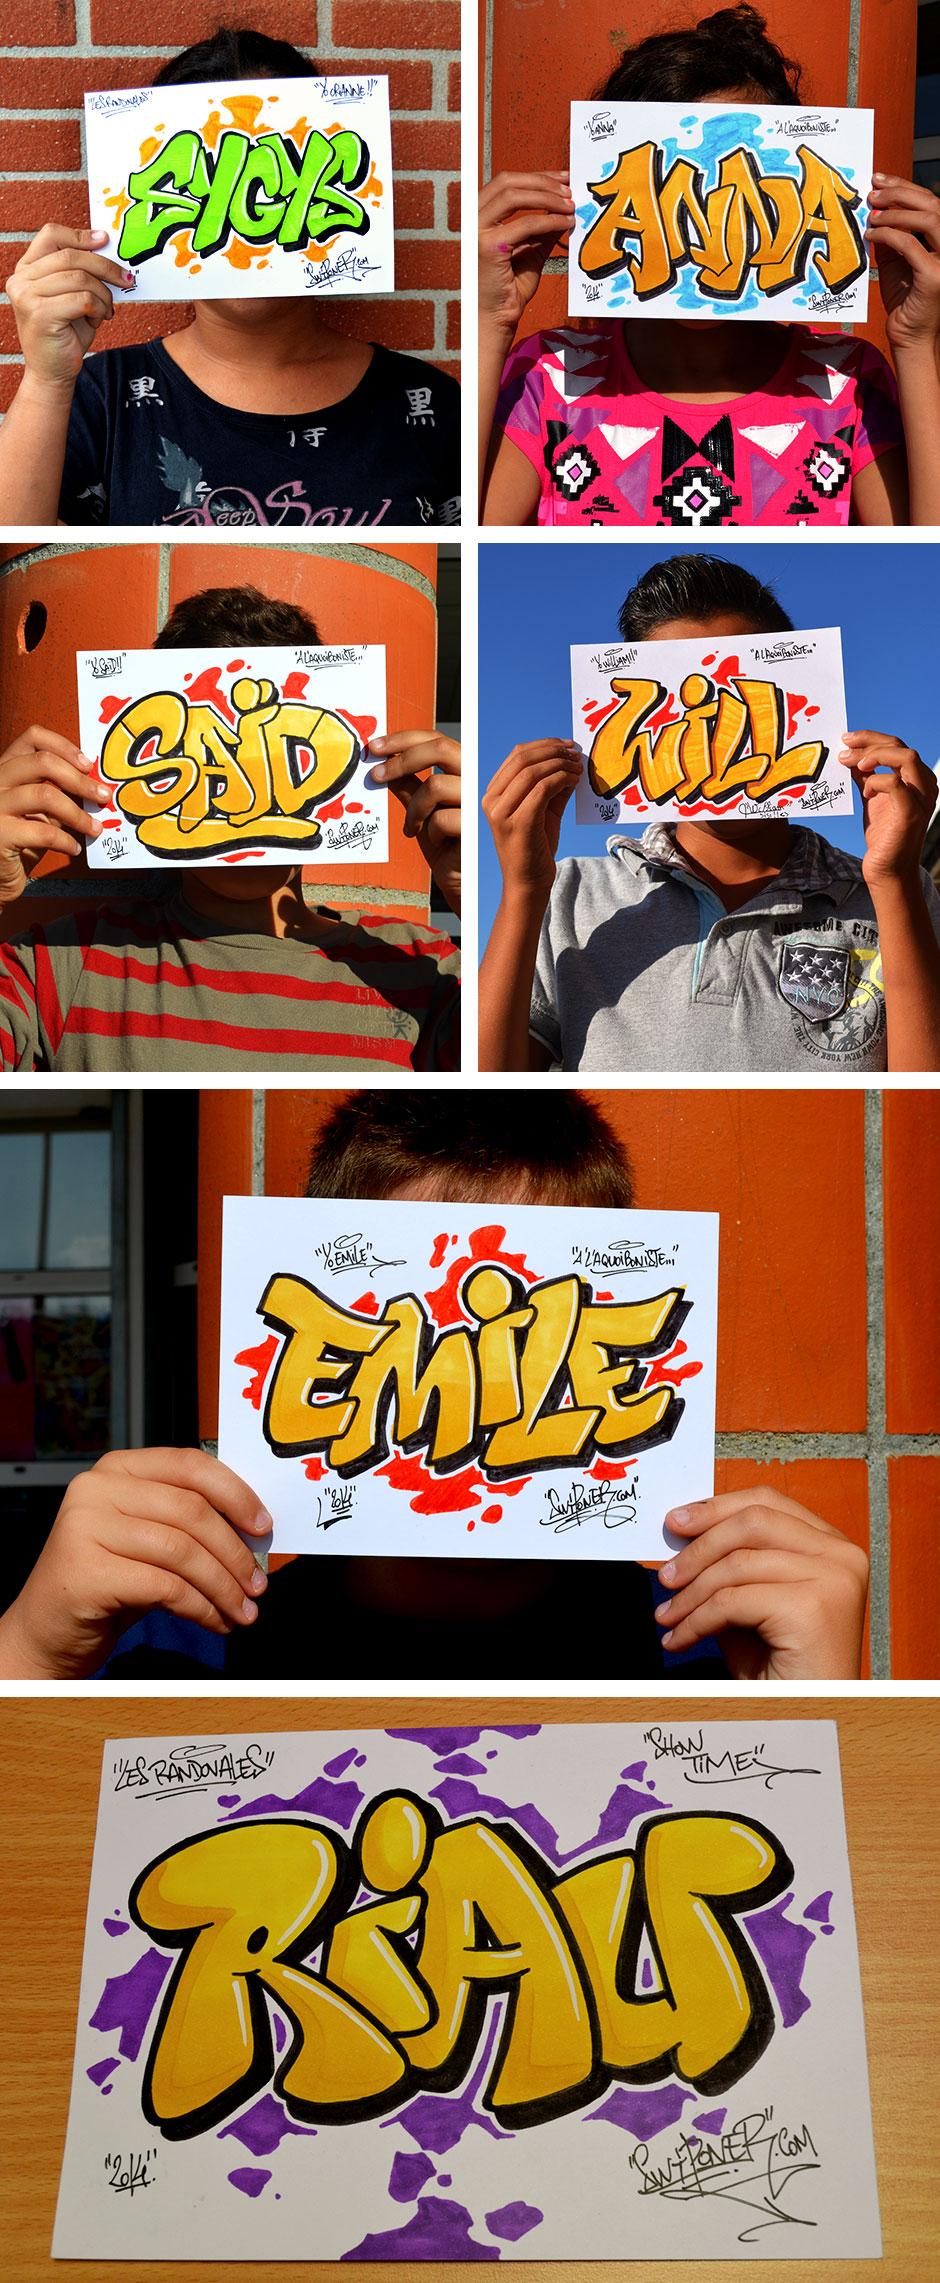 Animation-graffiti-toulouse-prenoms-montage-2-deco-graffiti-toulouse-swip-swiponer-wxp-animation-prenom